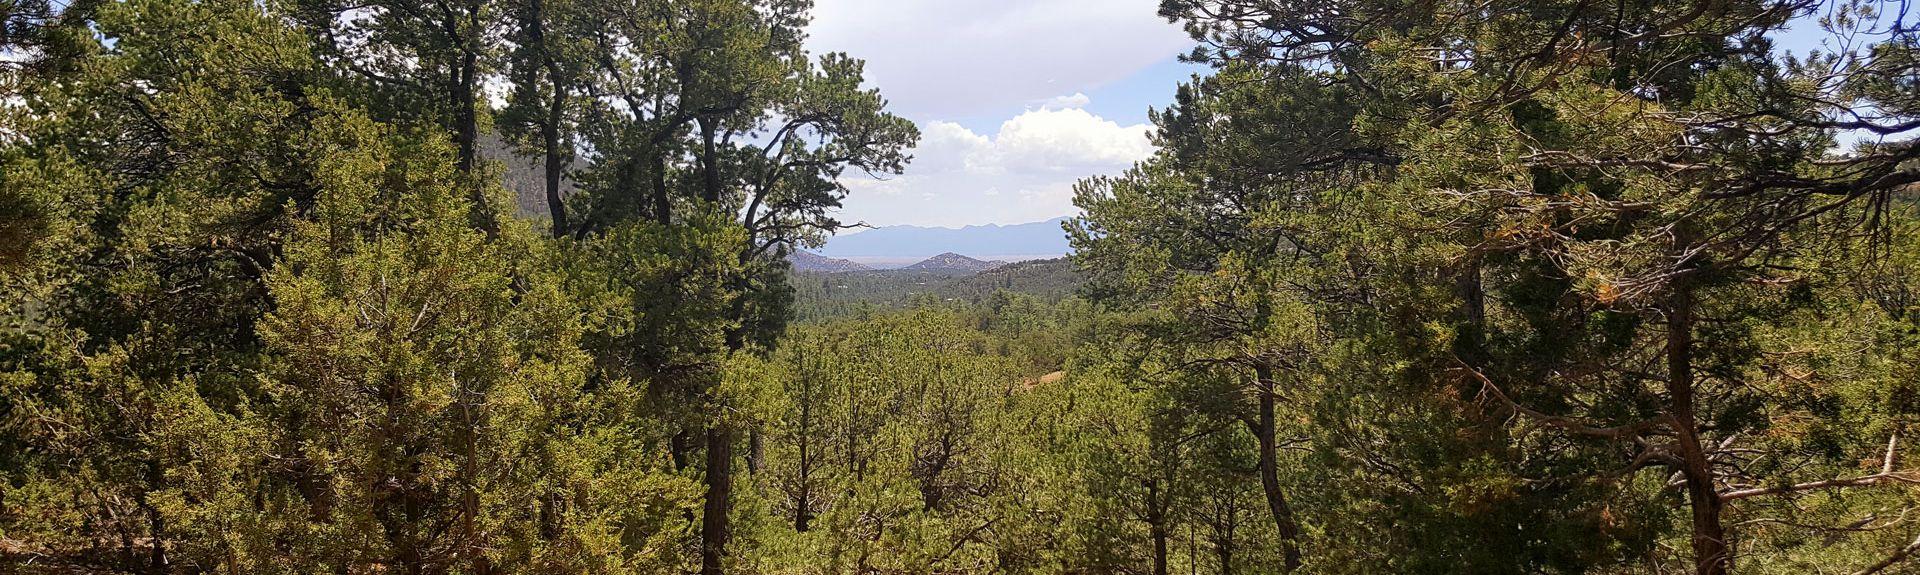 Pecos, NM, USA